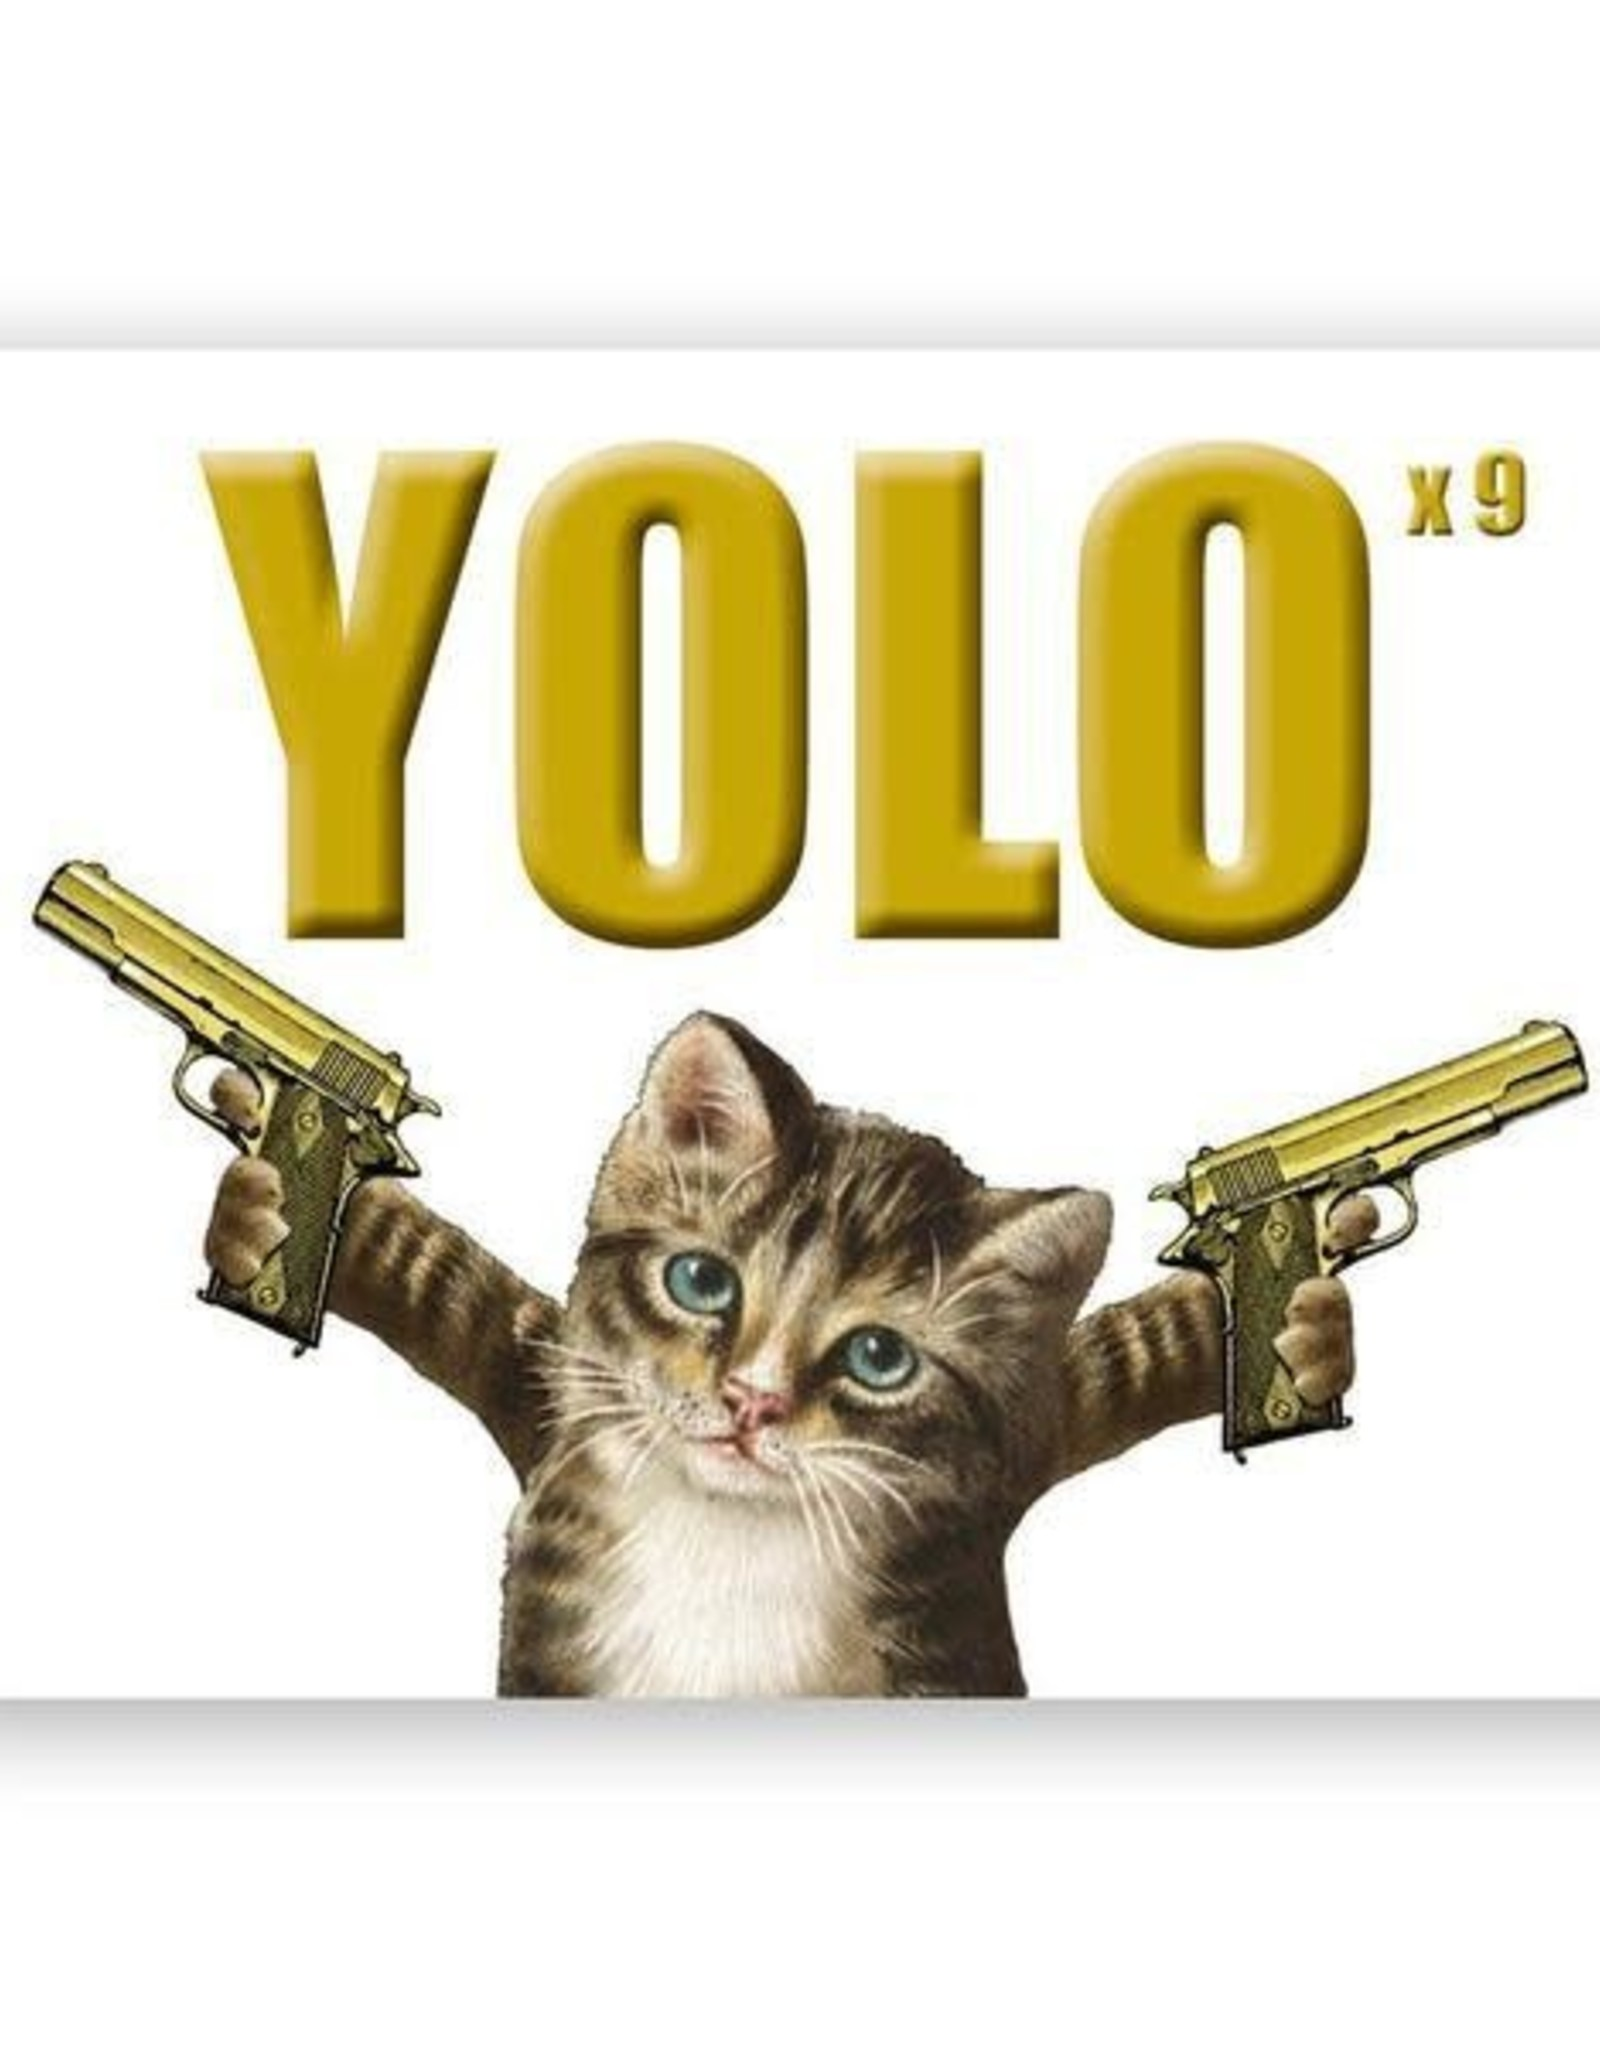 Mincing Mockingbird YOLO Cat Greeting Card - The Mincing Mockingbird